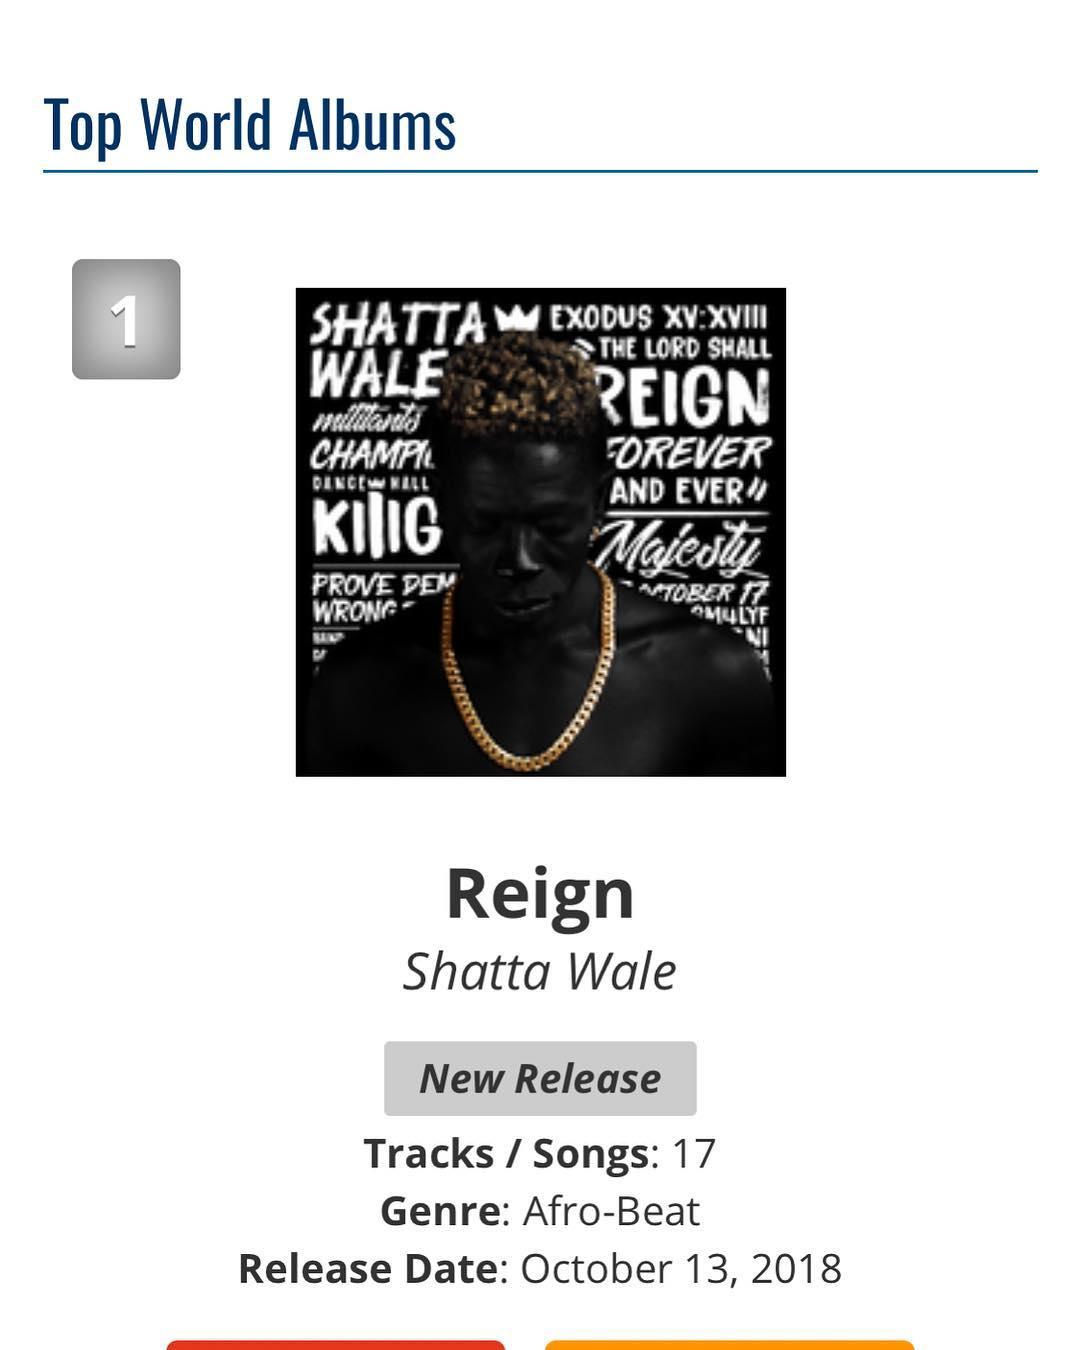 Shatta Wale's Reign Album Tops iTunes Top 100 World Albums